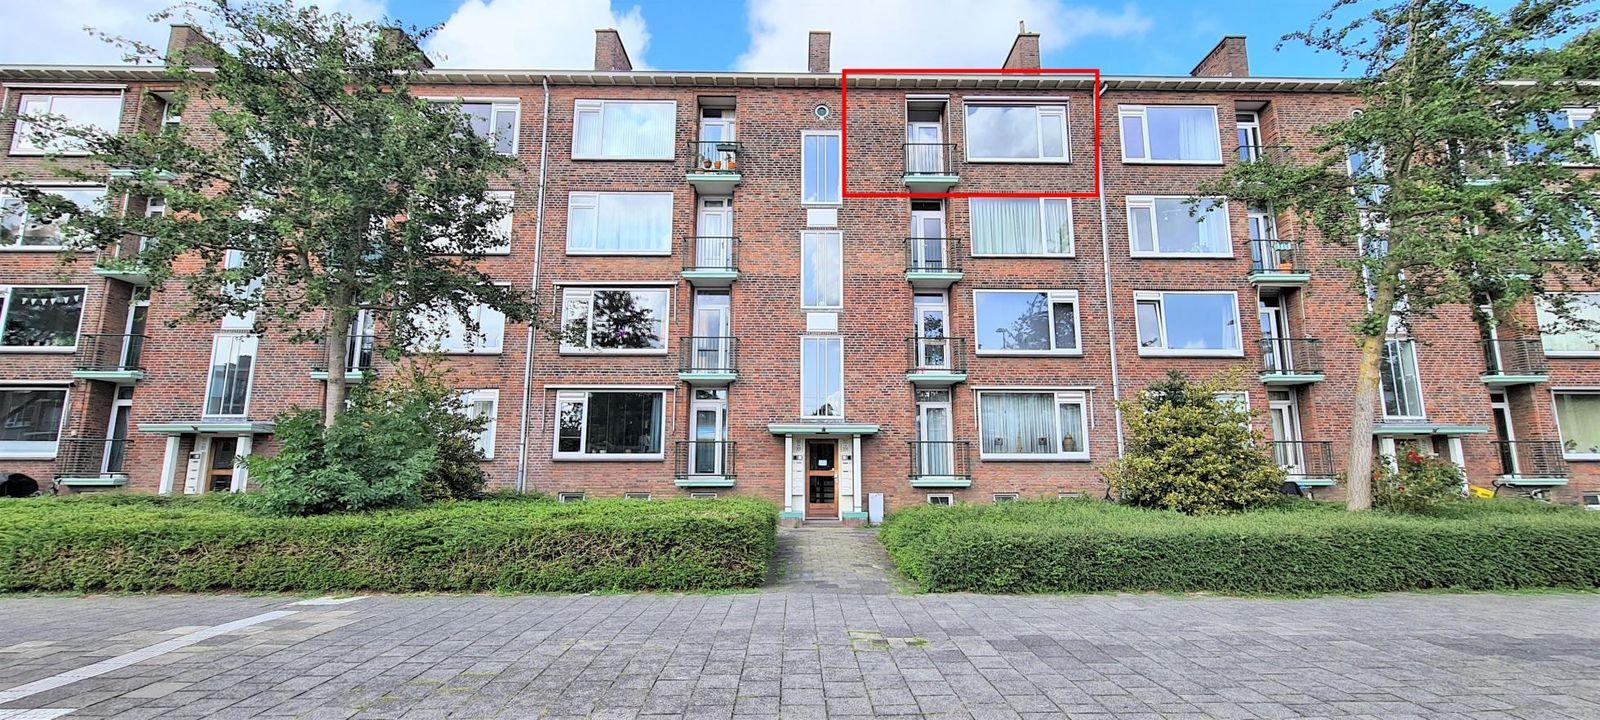 Koningin Julianalaan 203, Voorburg